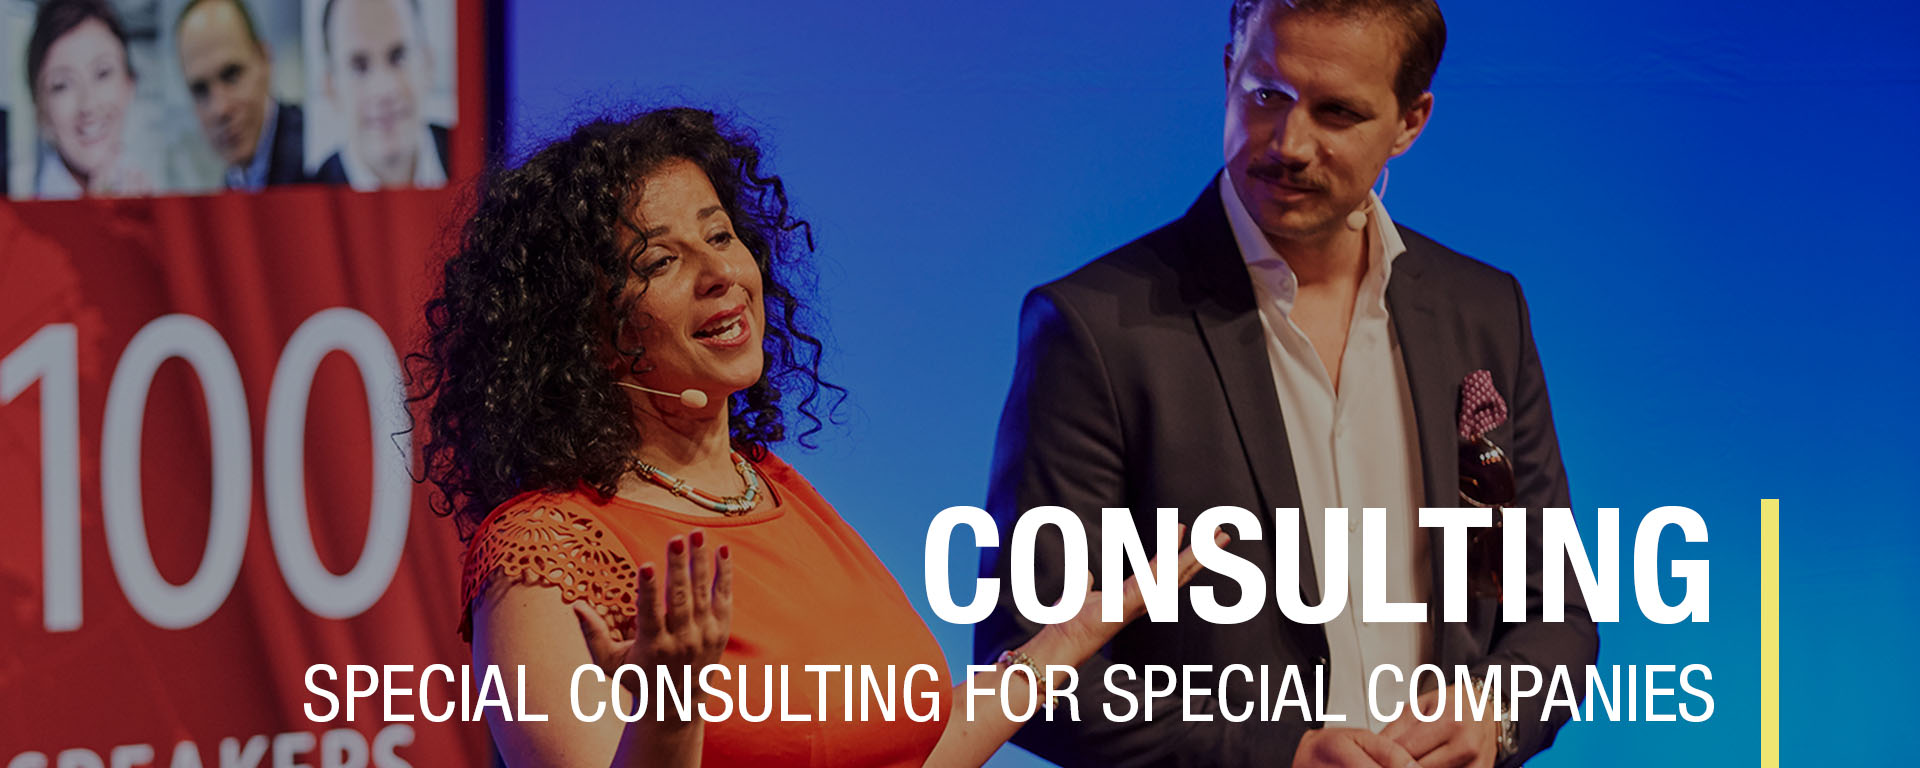 Consulting, change management, organizational development, process optimization